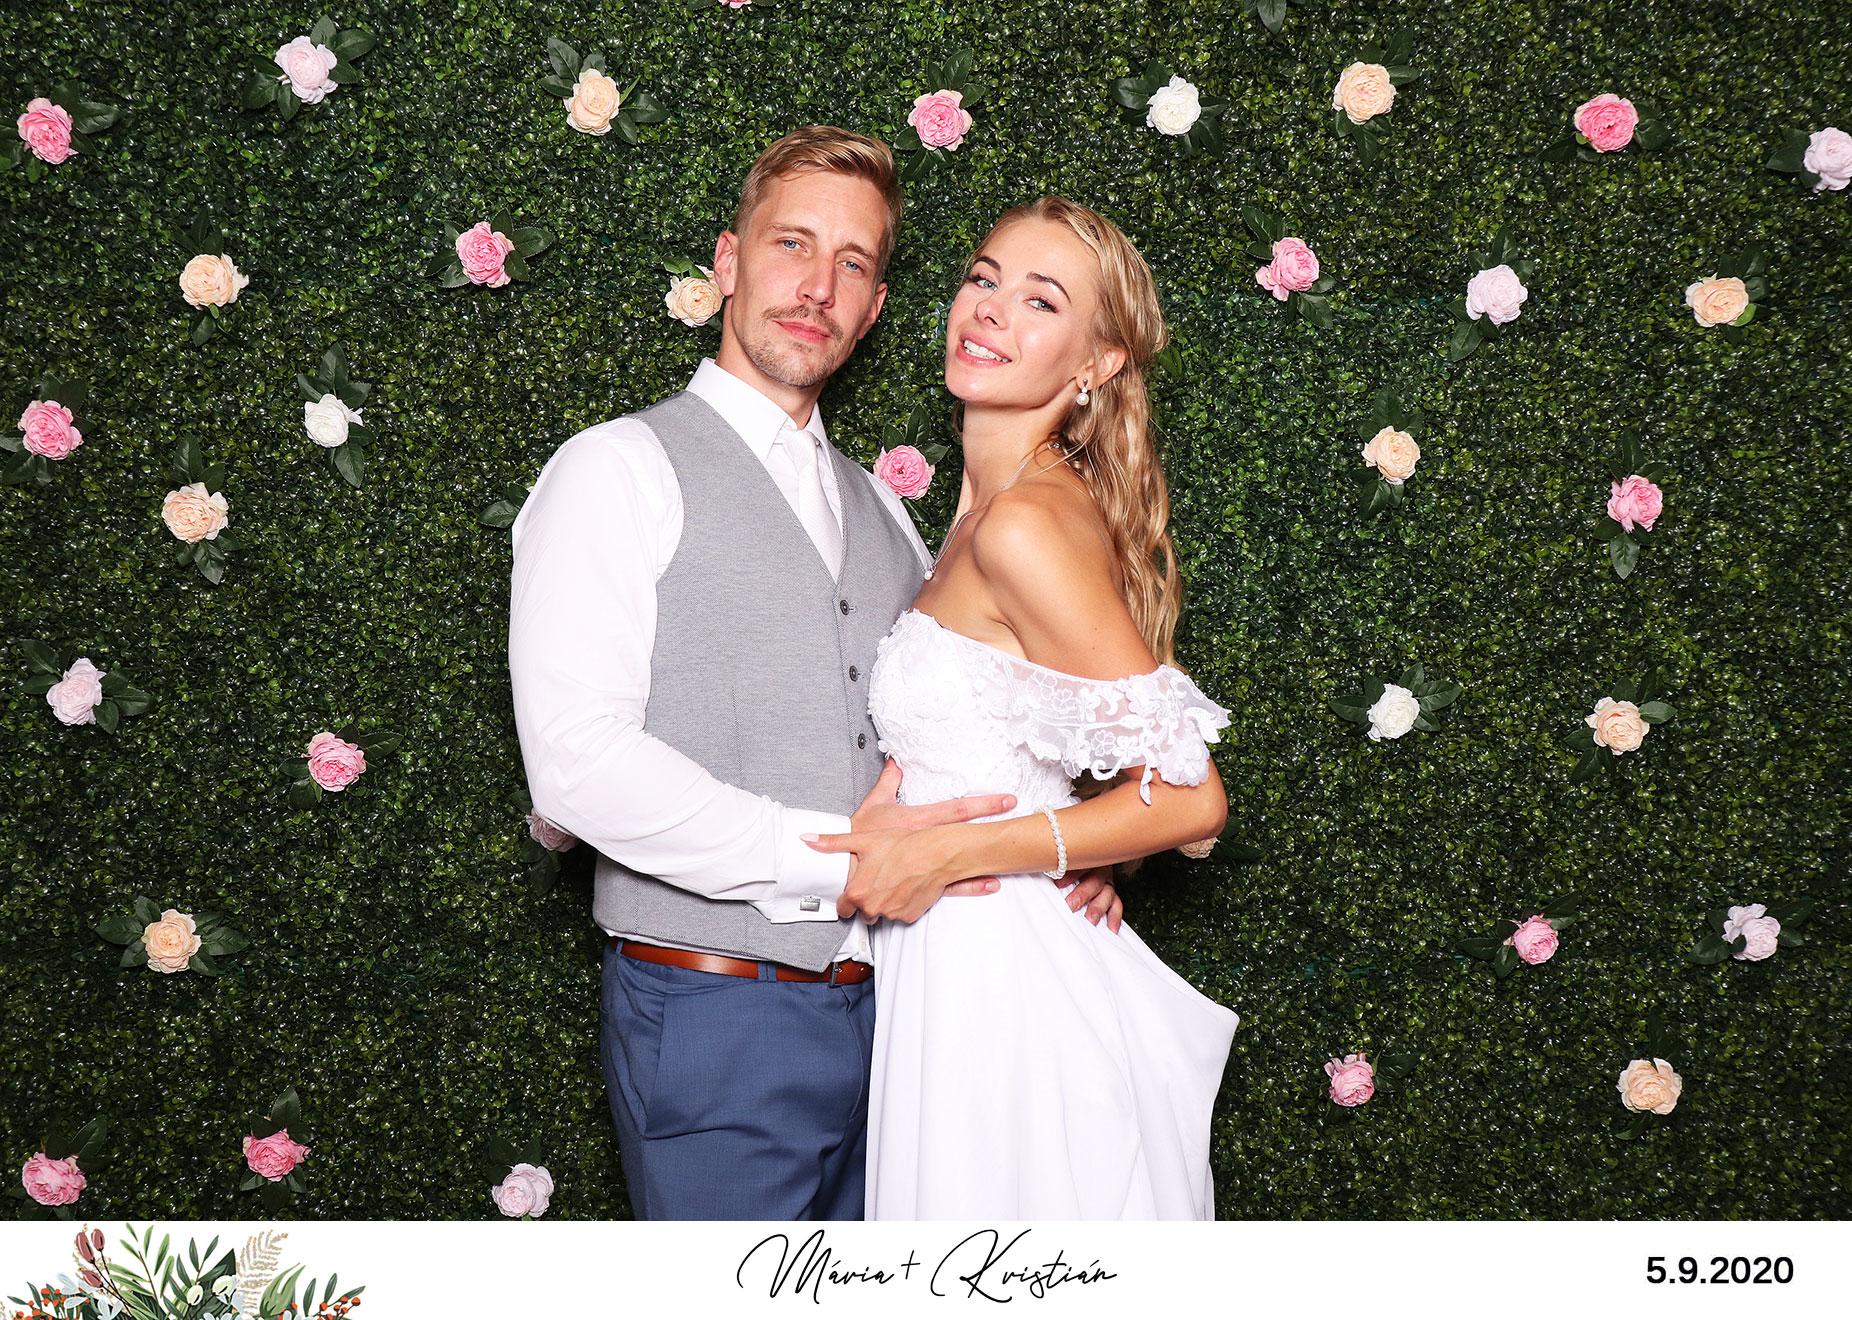 svadba fotokutik floral fotostena